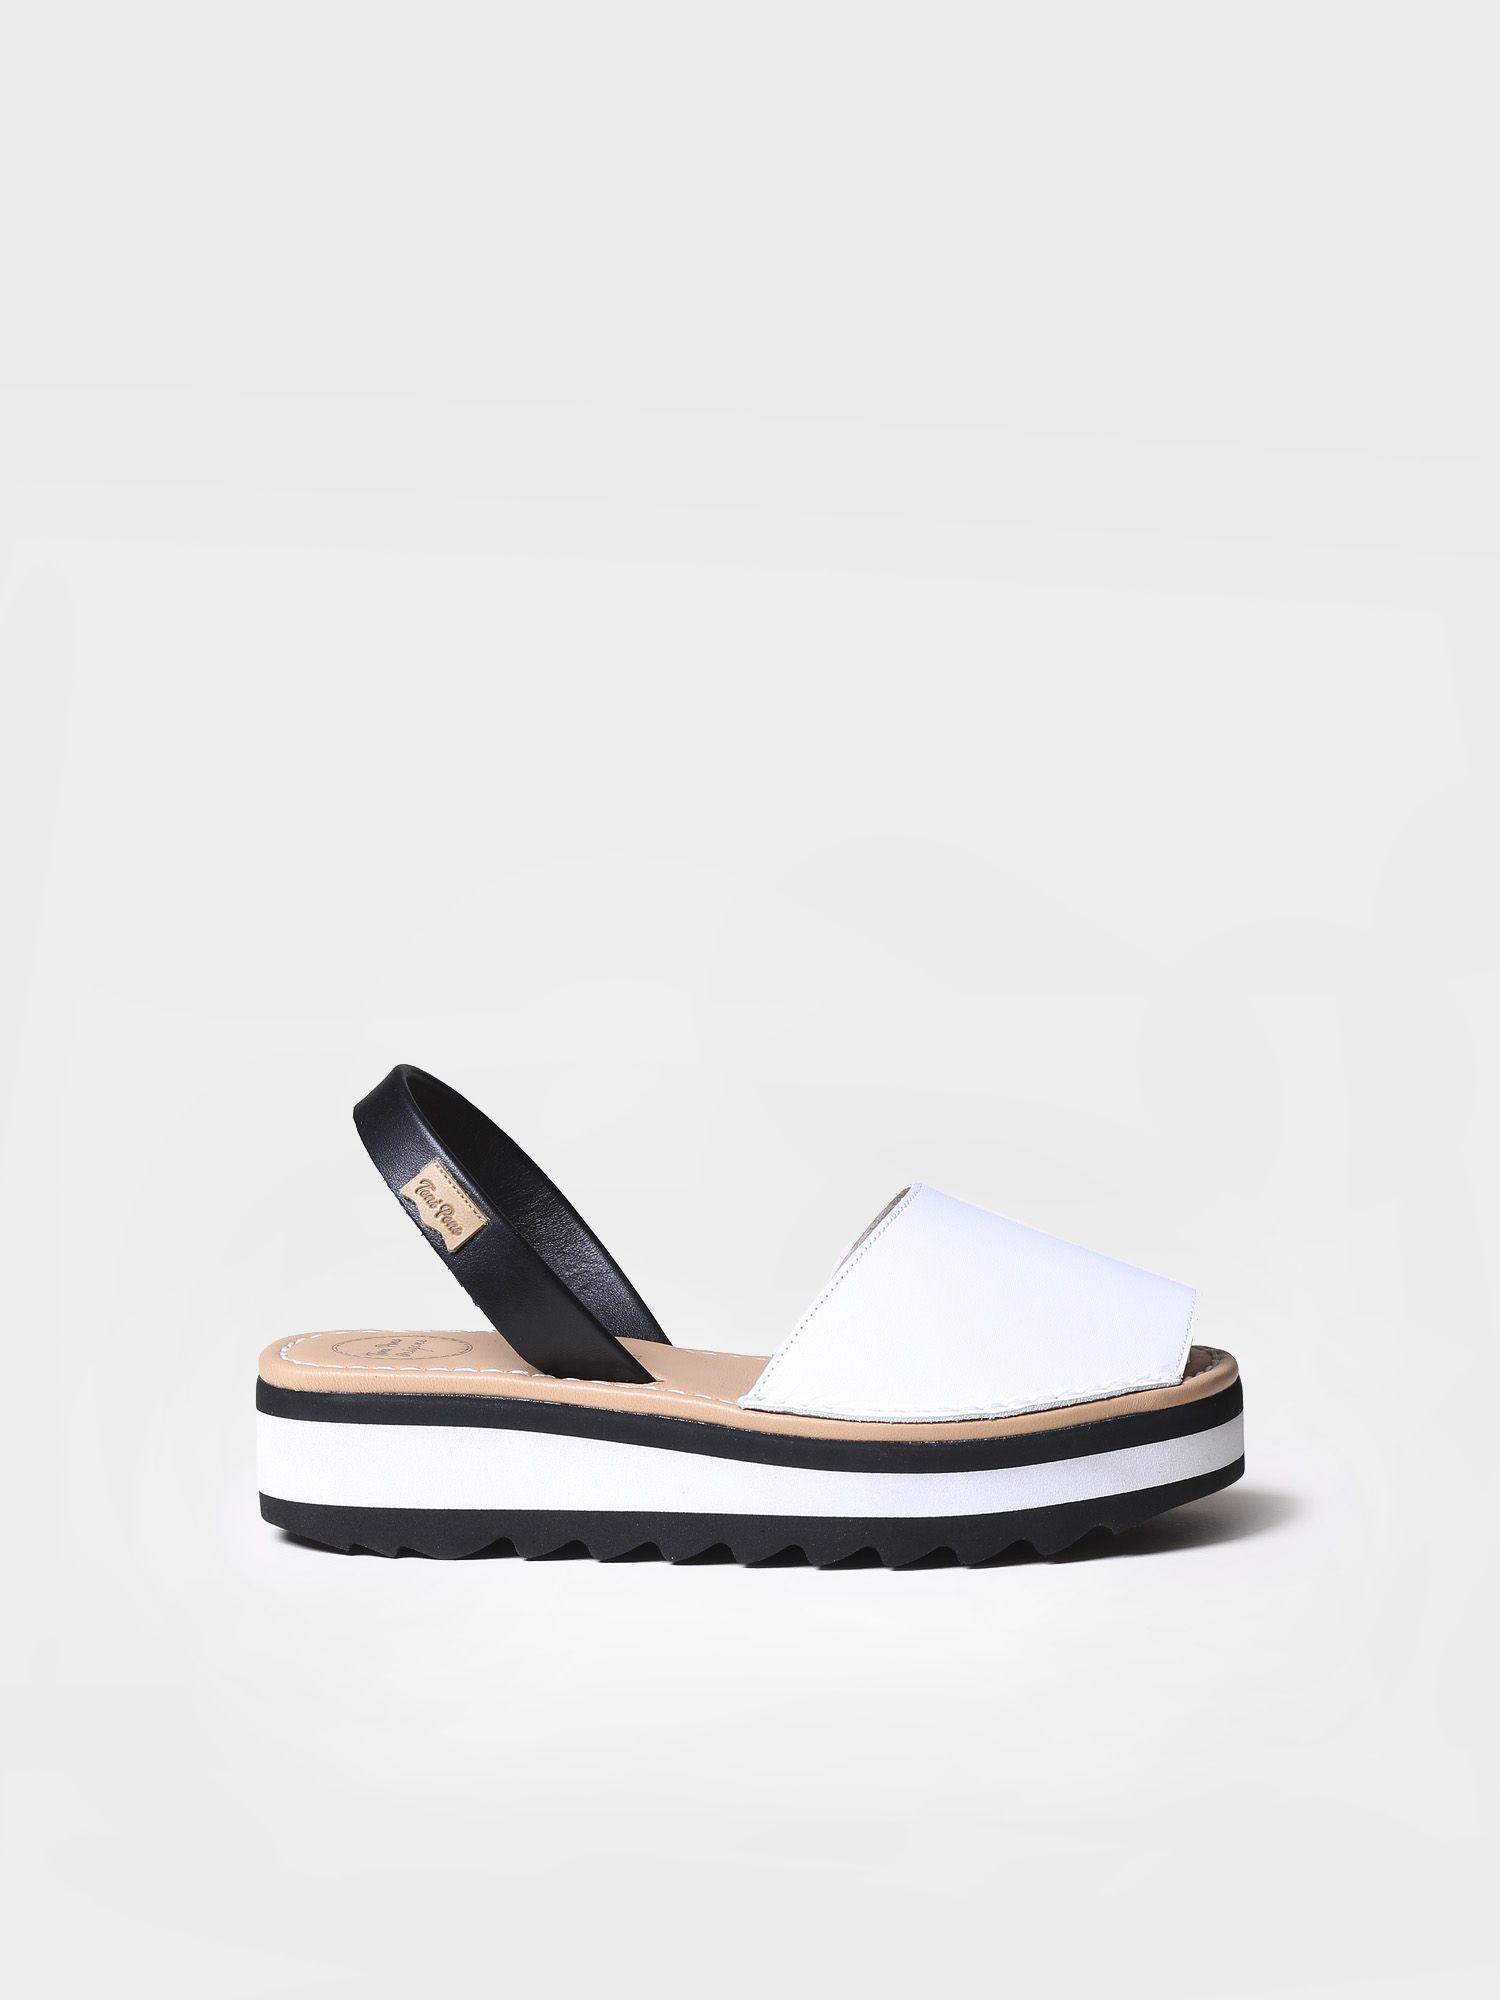 Leather avarca sandal - SOLLER-P